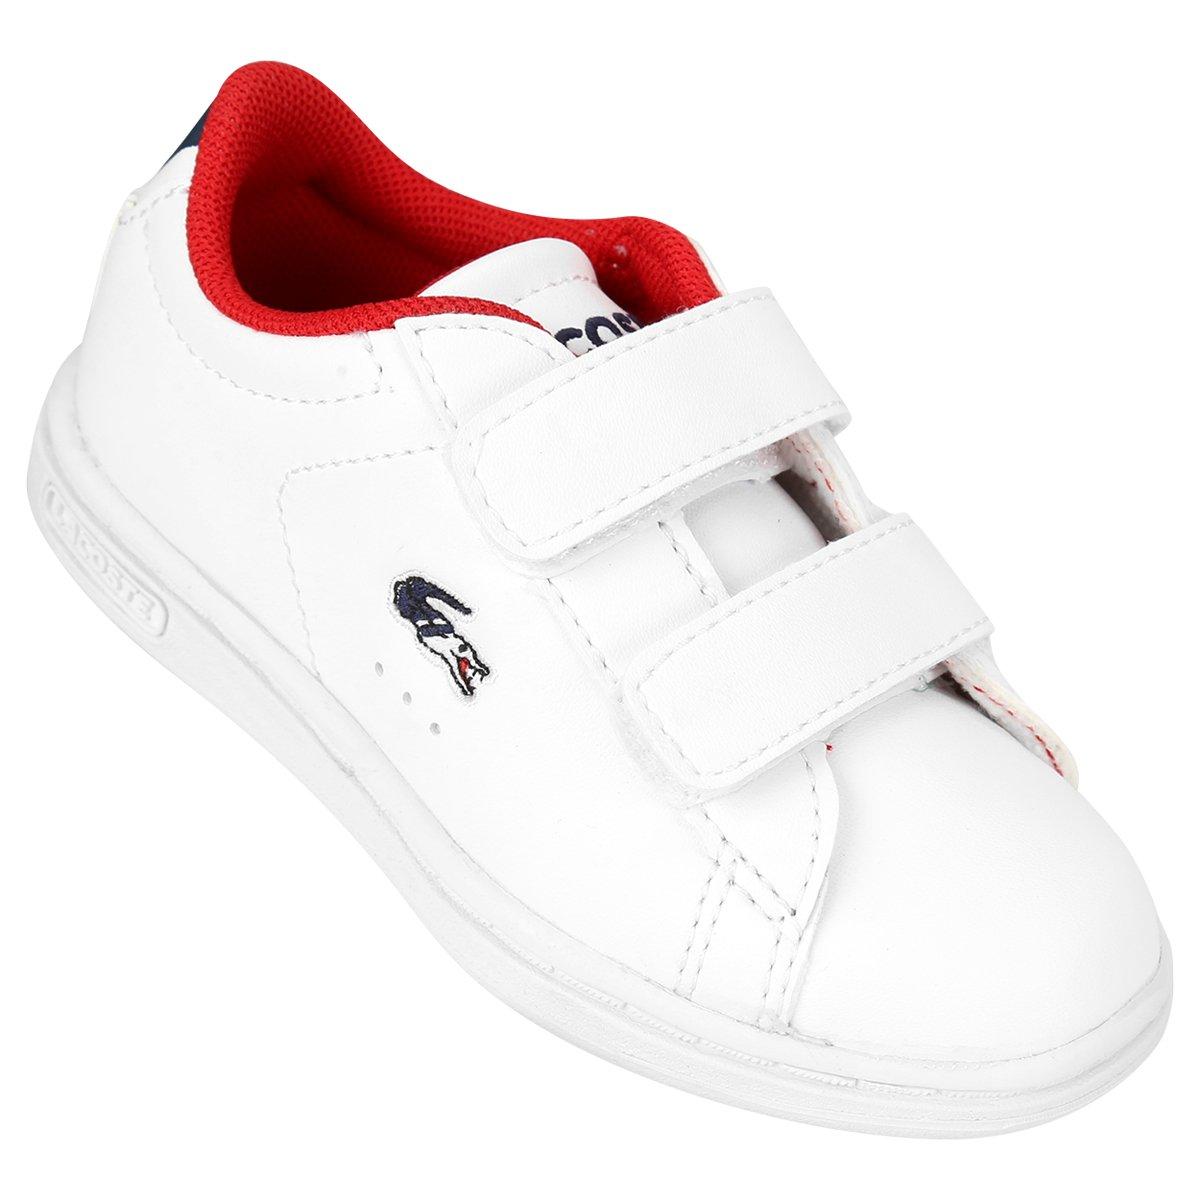 66c27413bb3 Tênis Lacoste Carnaby Evo Htb Infantil - Compre Agora